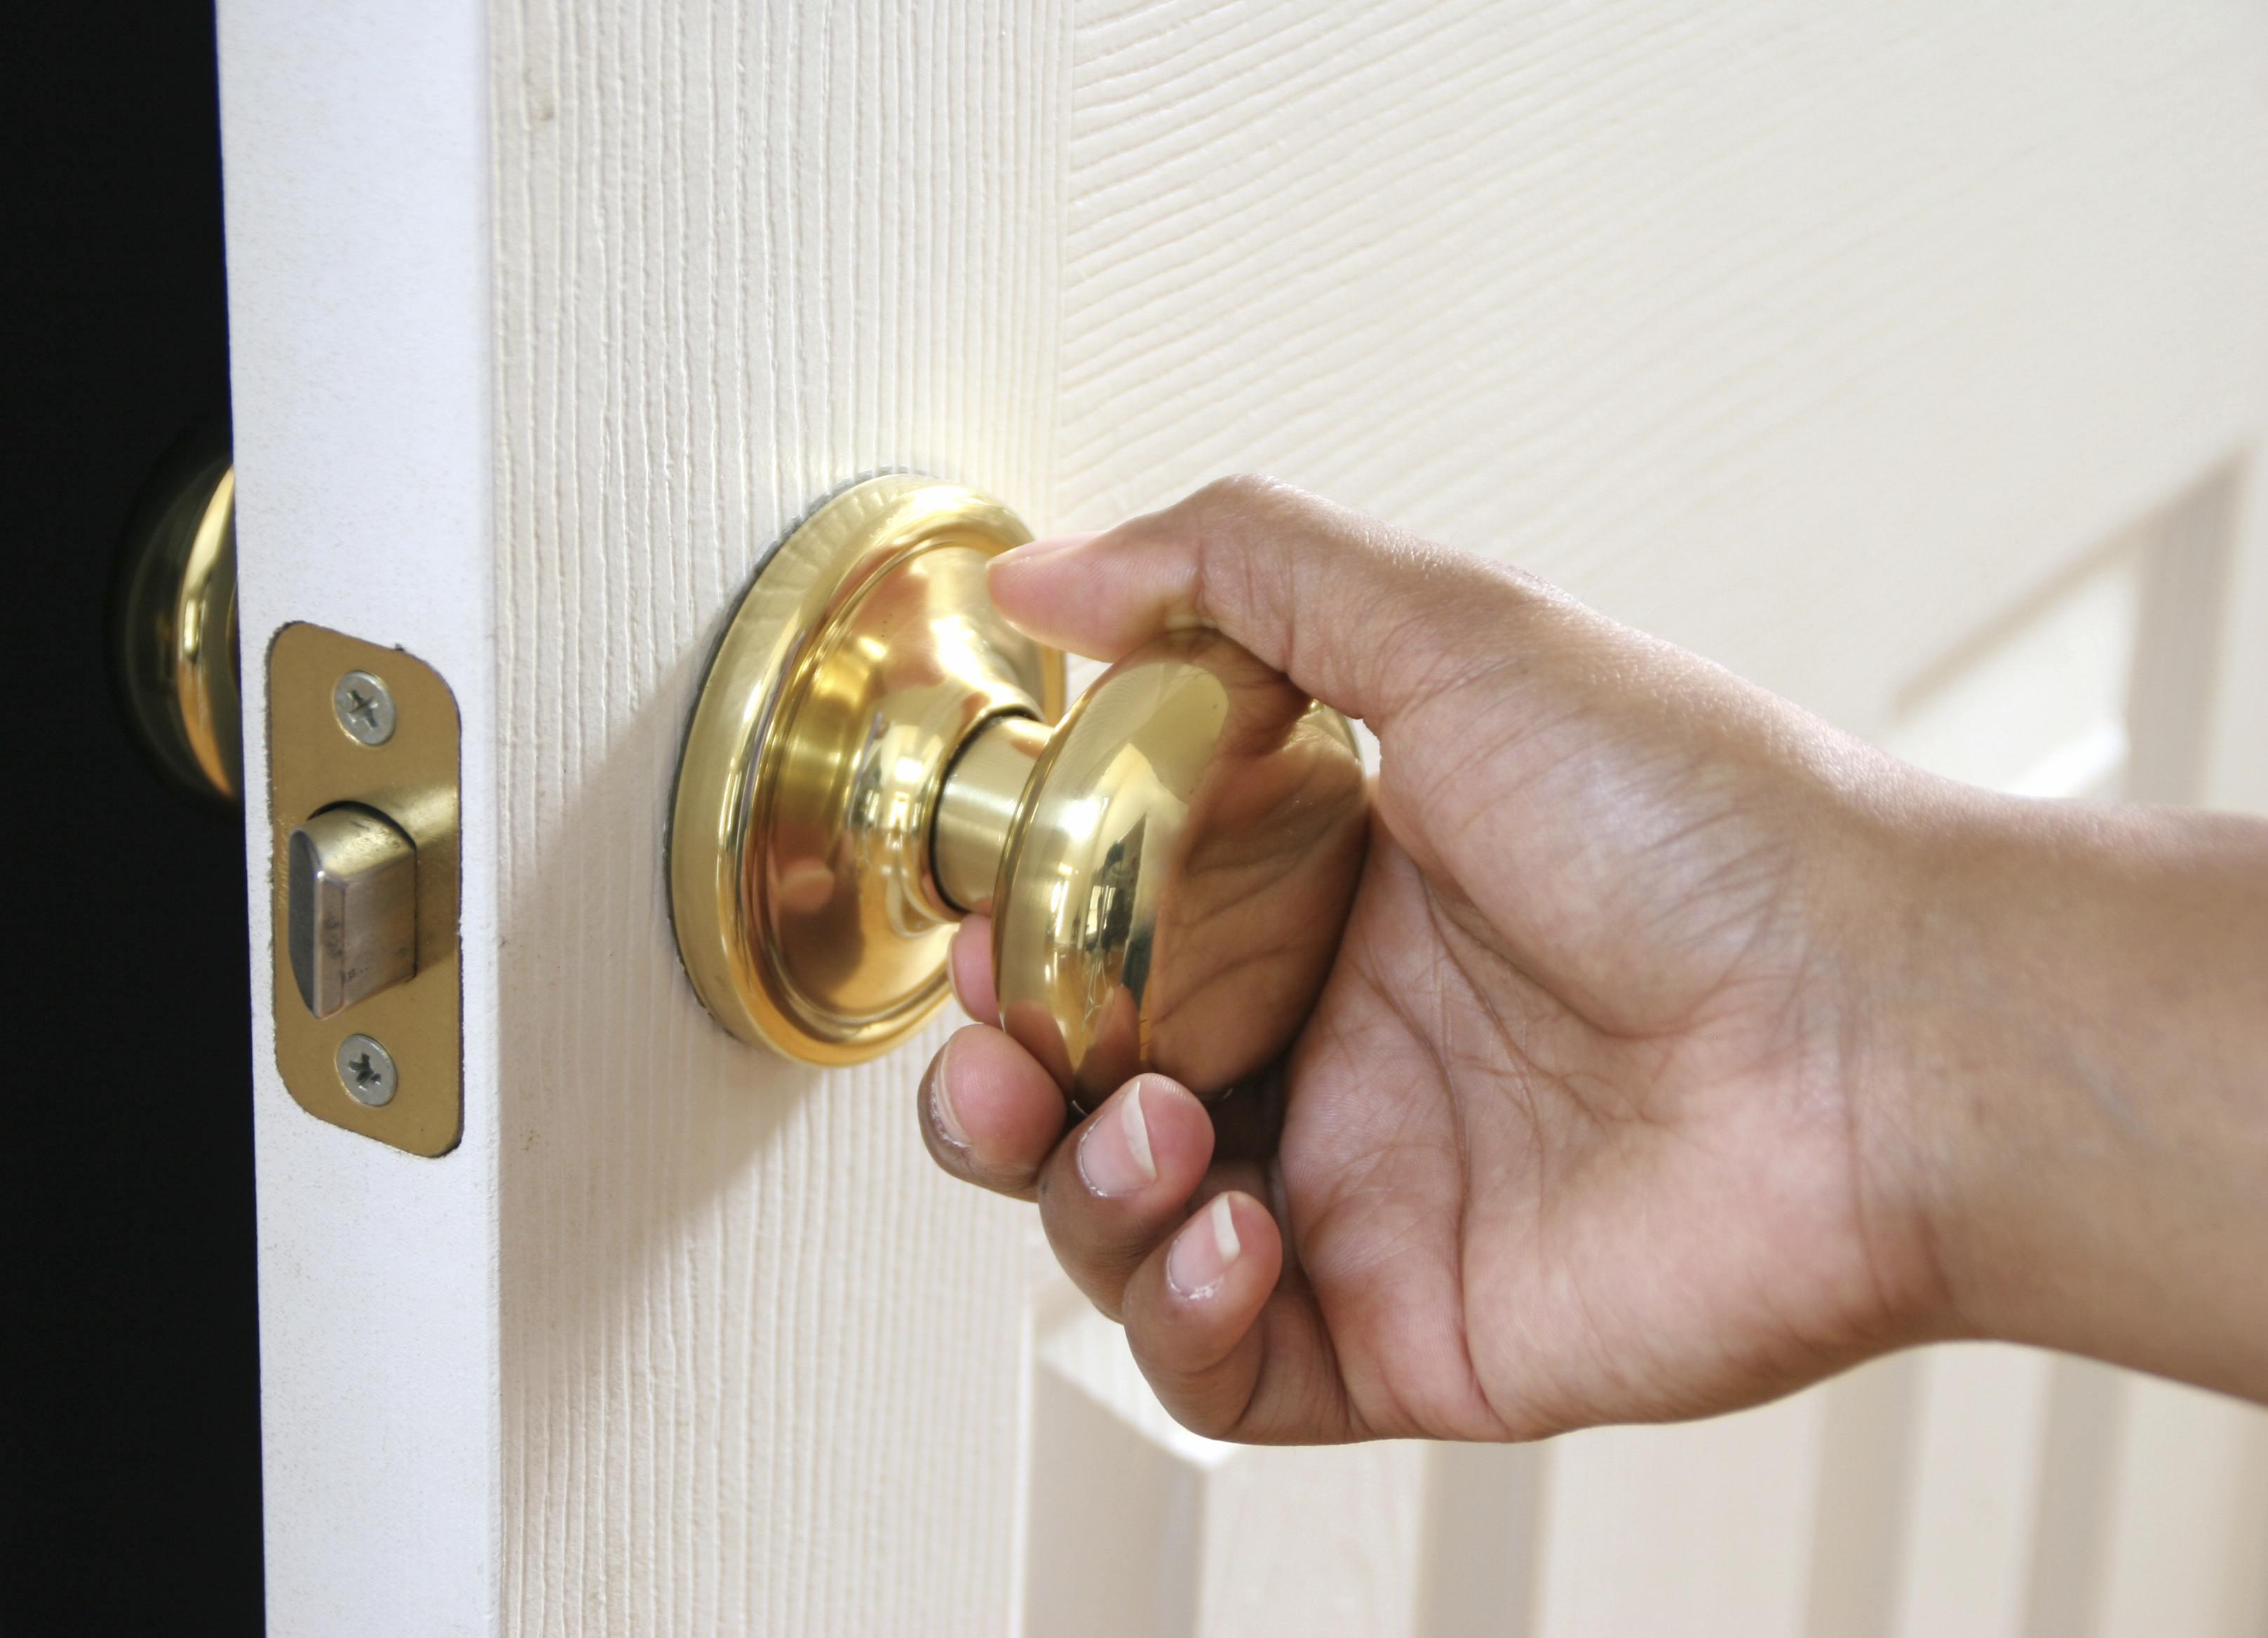 repair door knob photo - 2